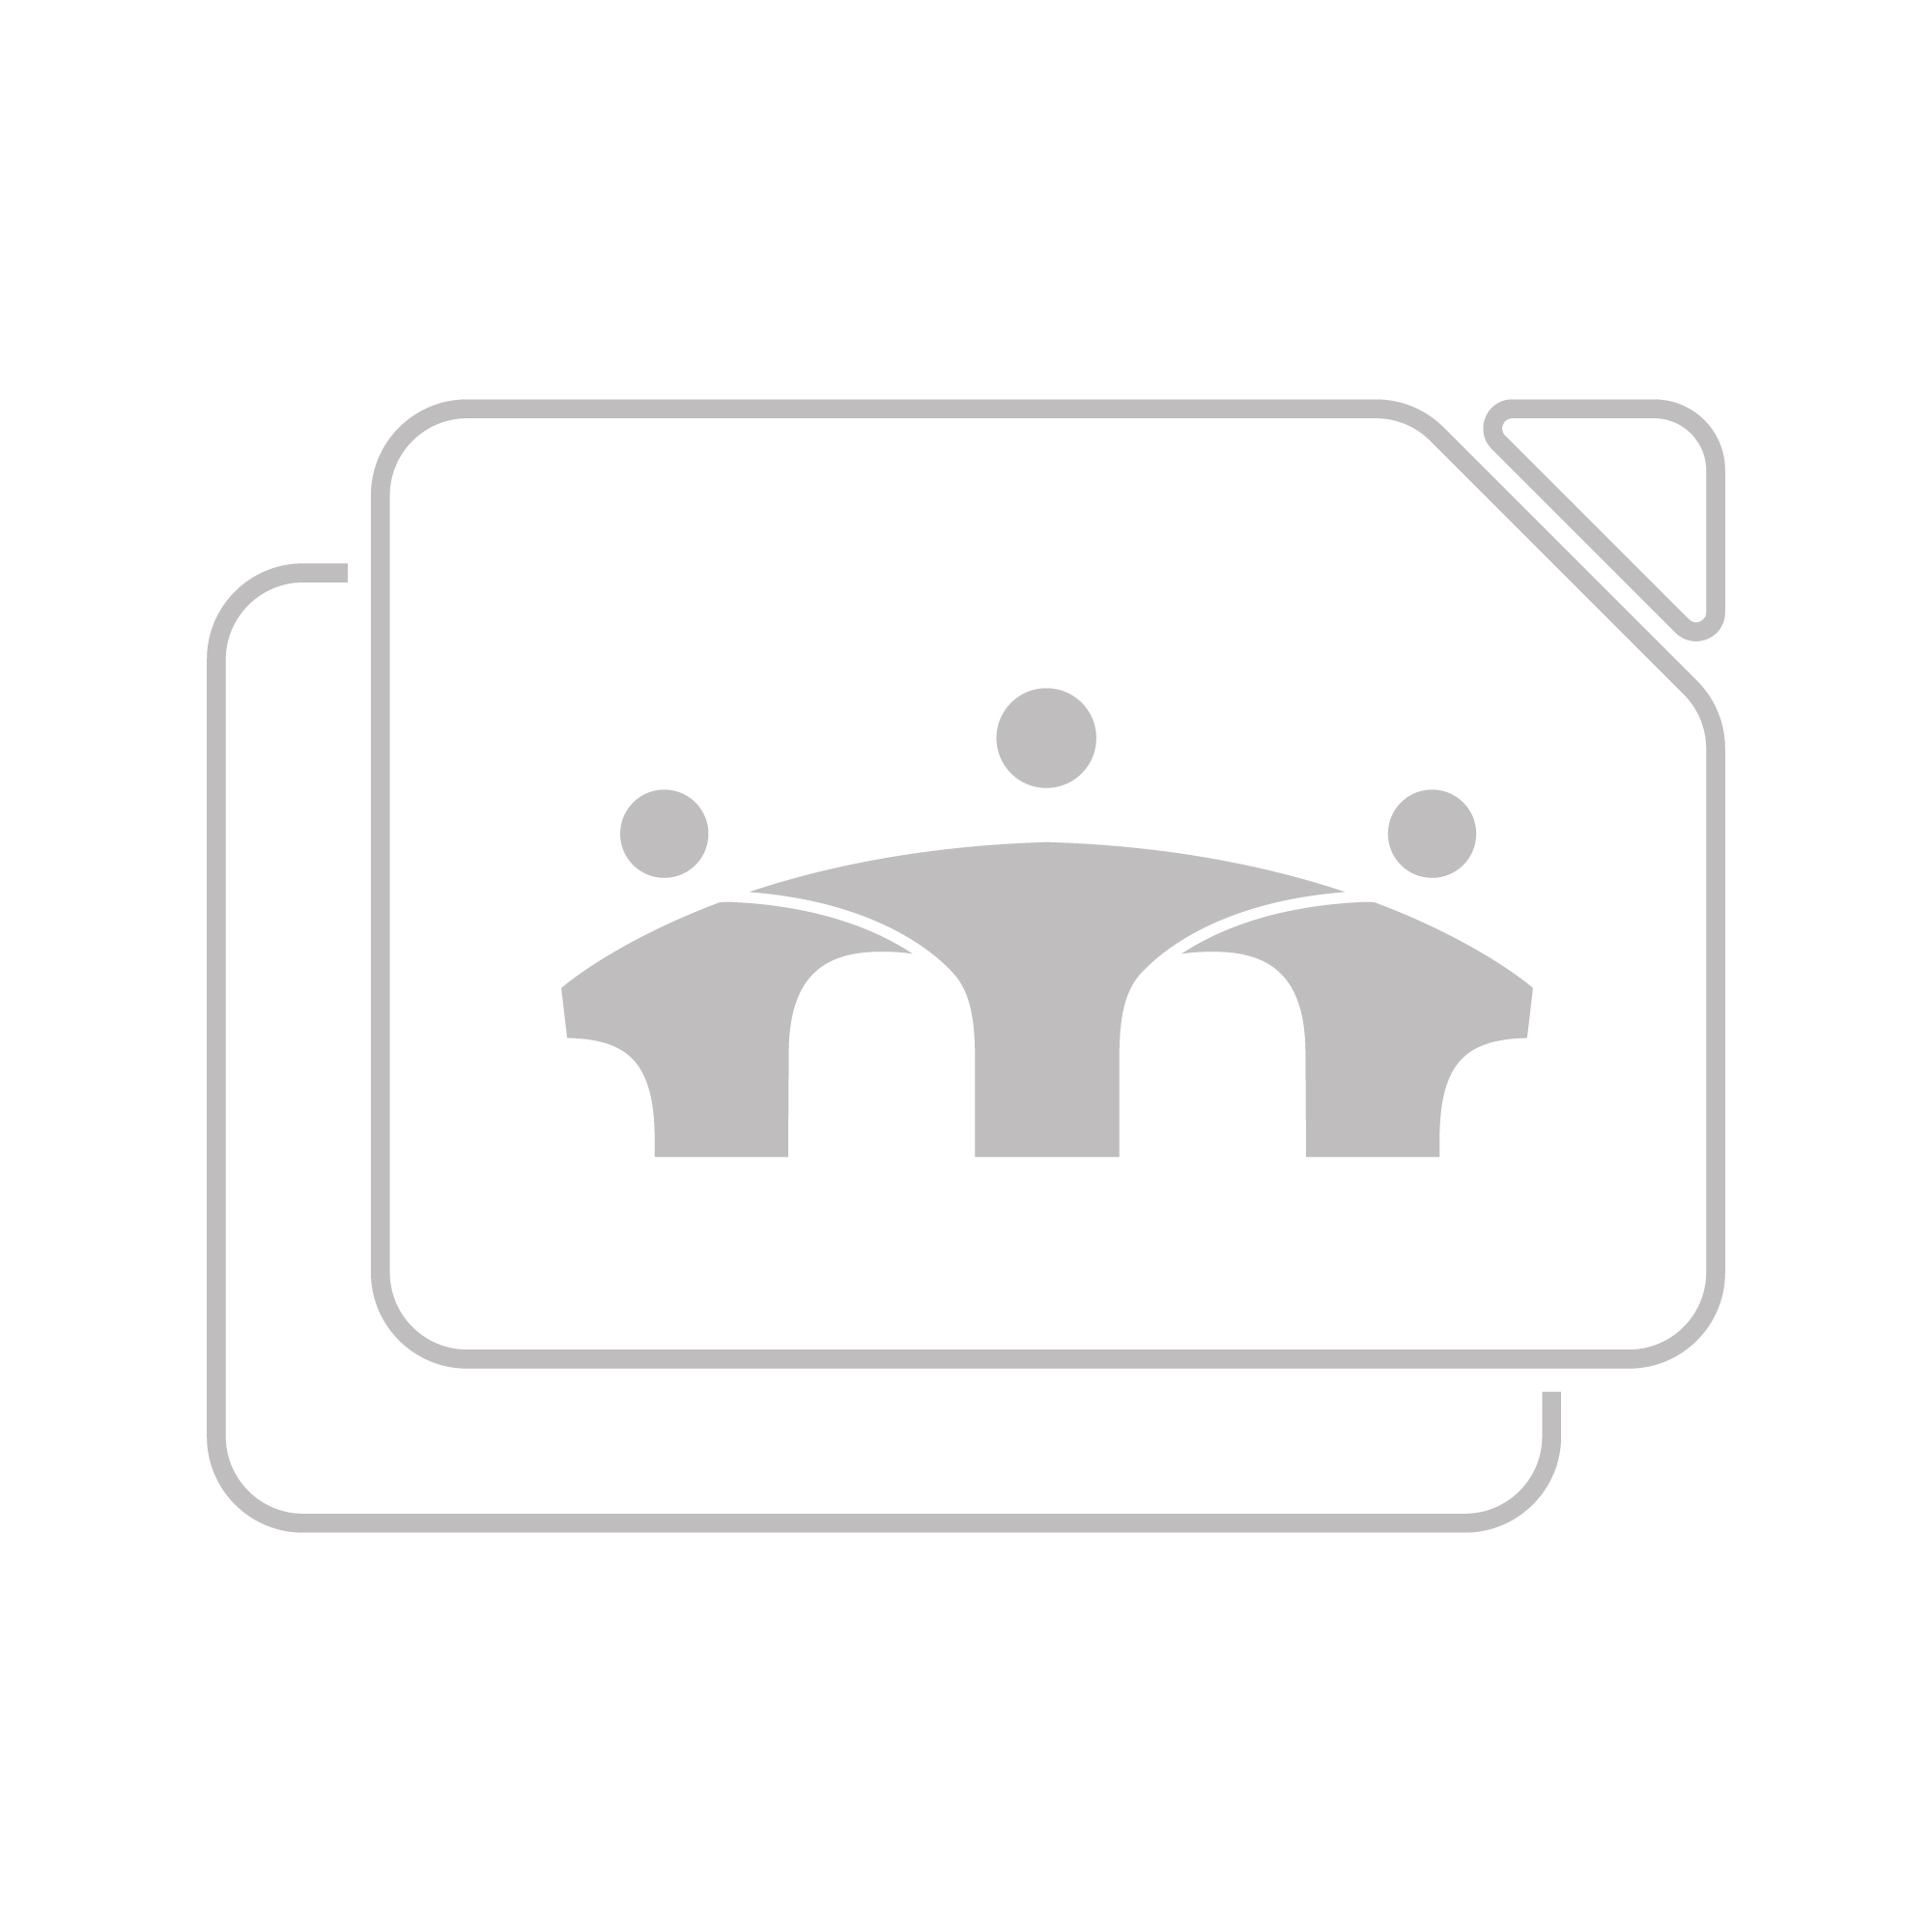 Logitech G815 LIGHTSYNC RGB Mechanical Gaming Keyboard – GL Clicky - CARBON - DEU - CENTRAL